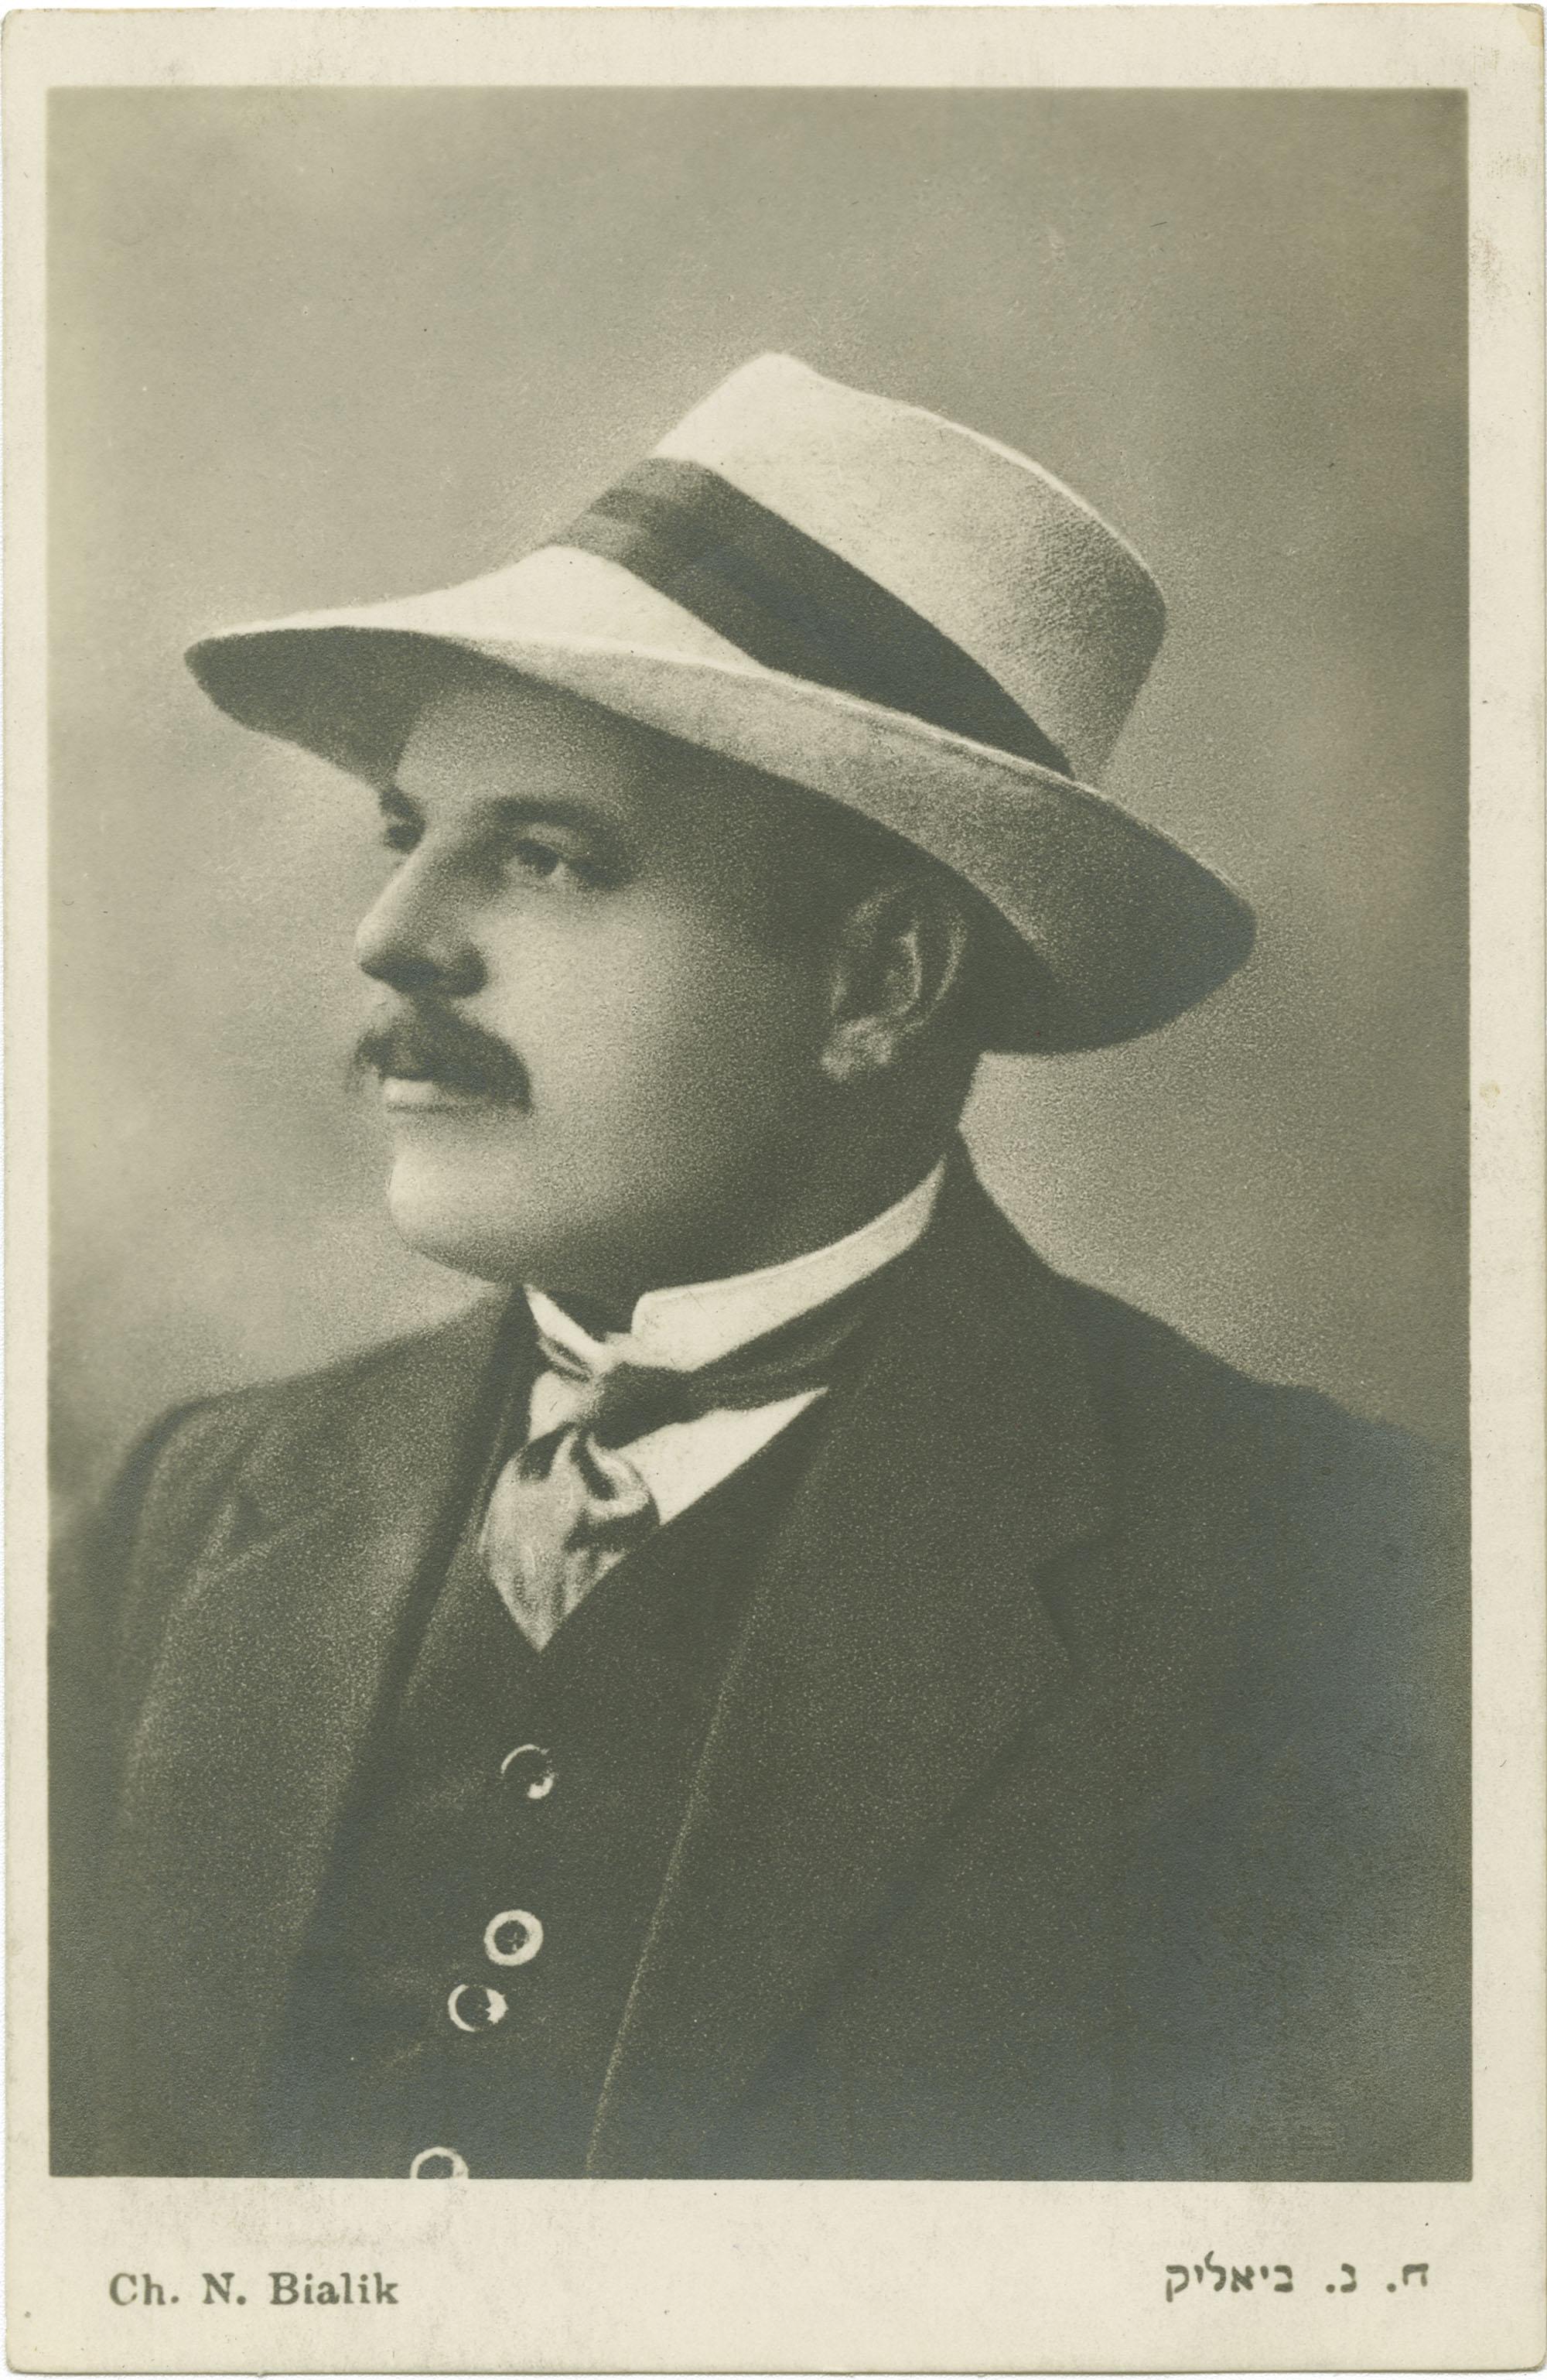 Ch. N. Bialik / ח. נ. ביאליק